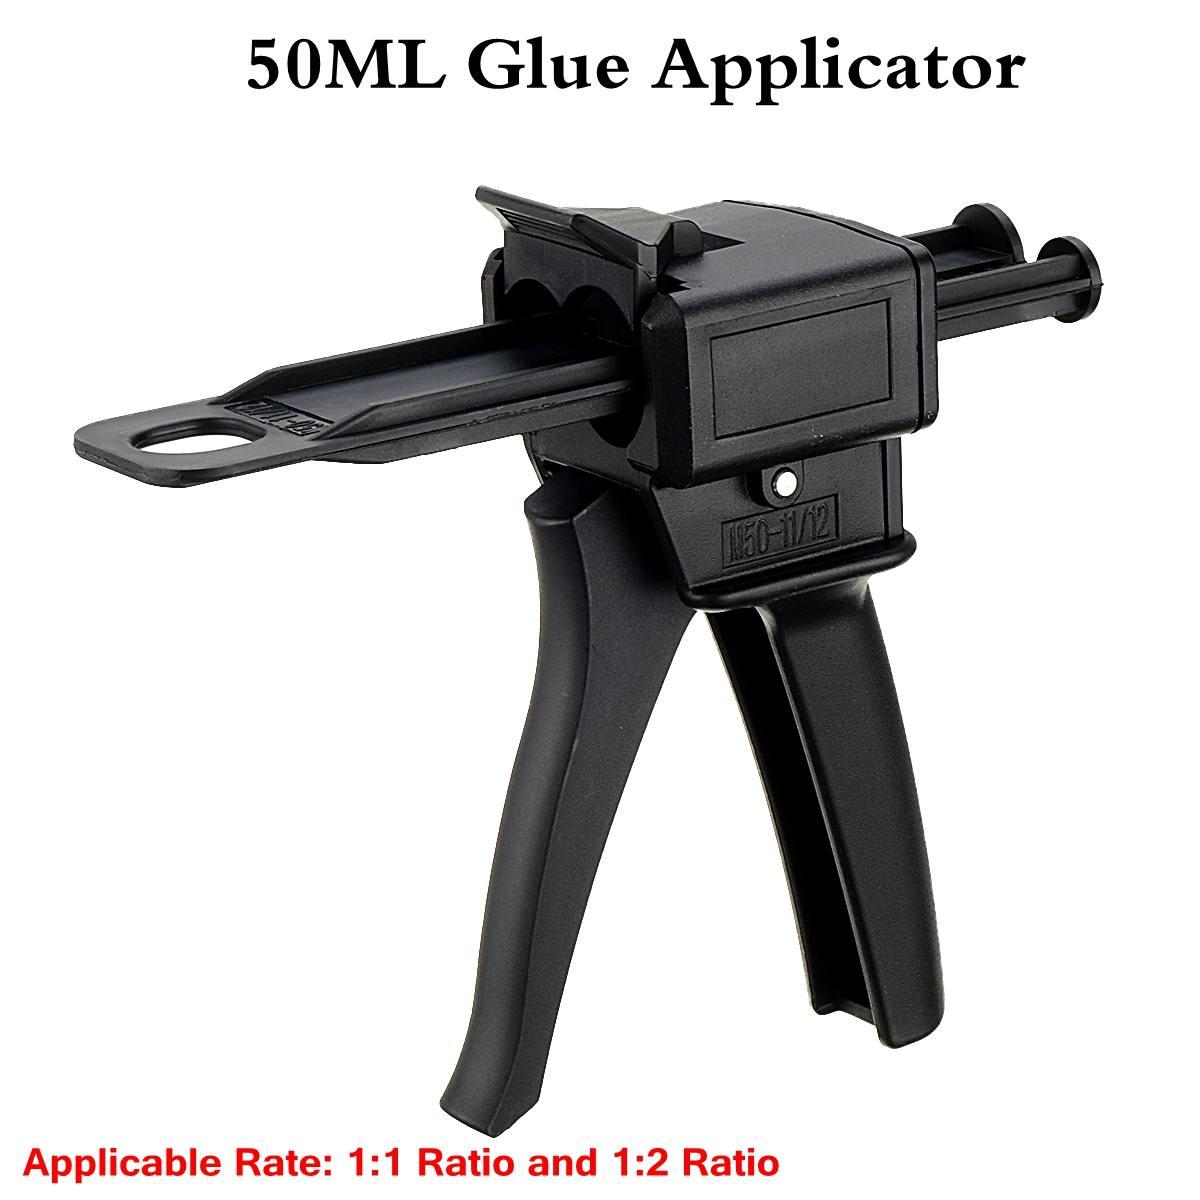 Glue G Un 50ml Two Component AB Epoxy Sealant Glue Applicator Glue Adhensive Squeeze Mixed 1:1/1:2 Manual Glue Applicator